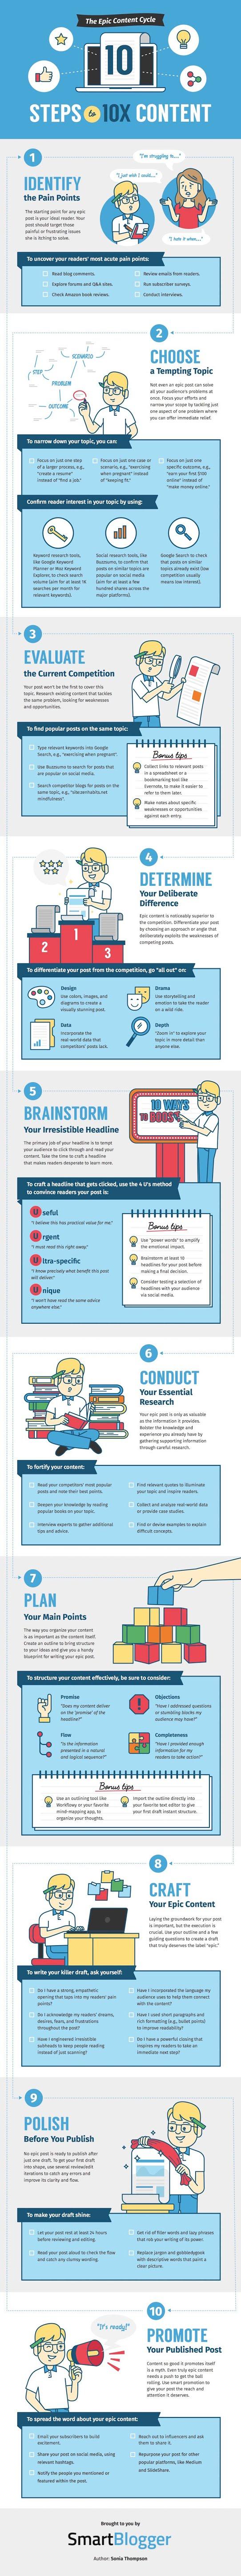 10 ways to improve content